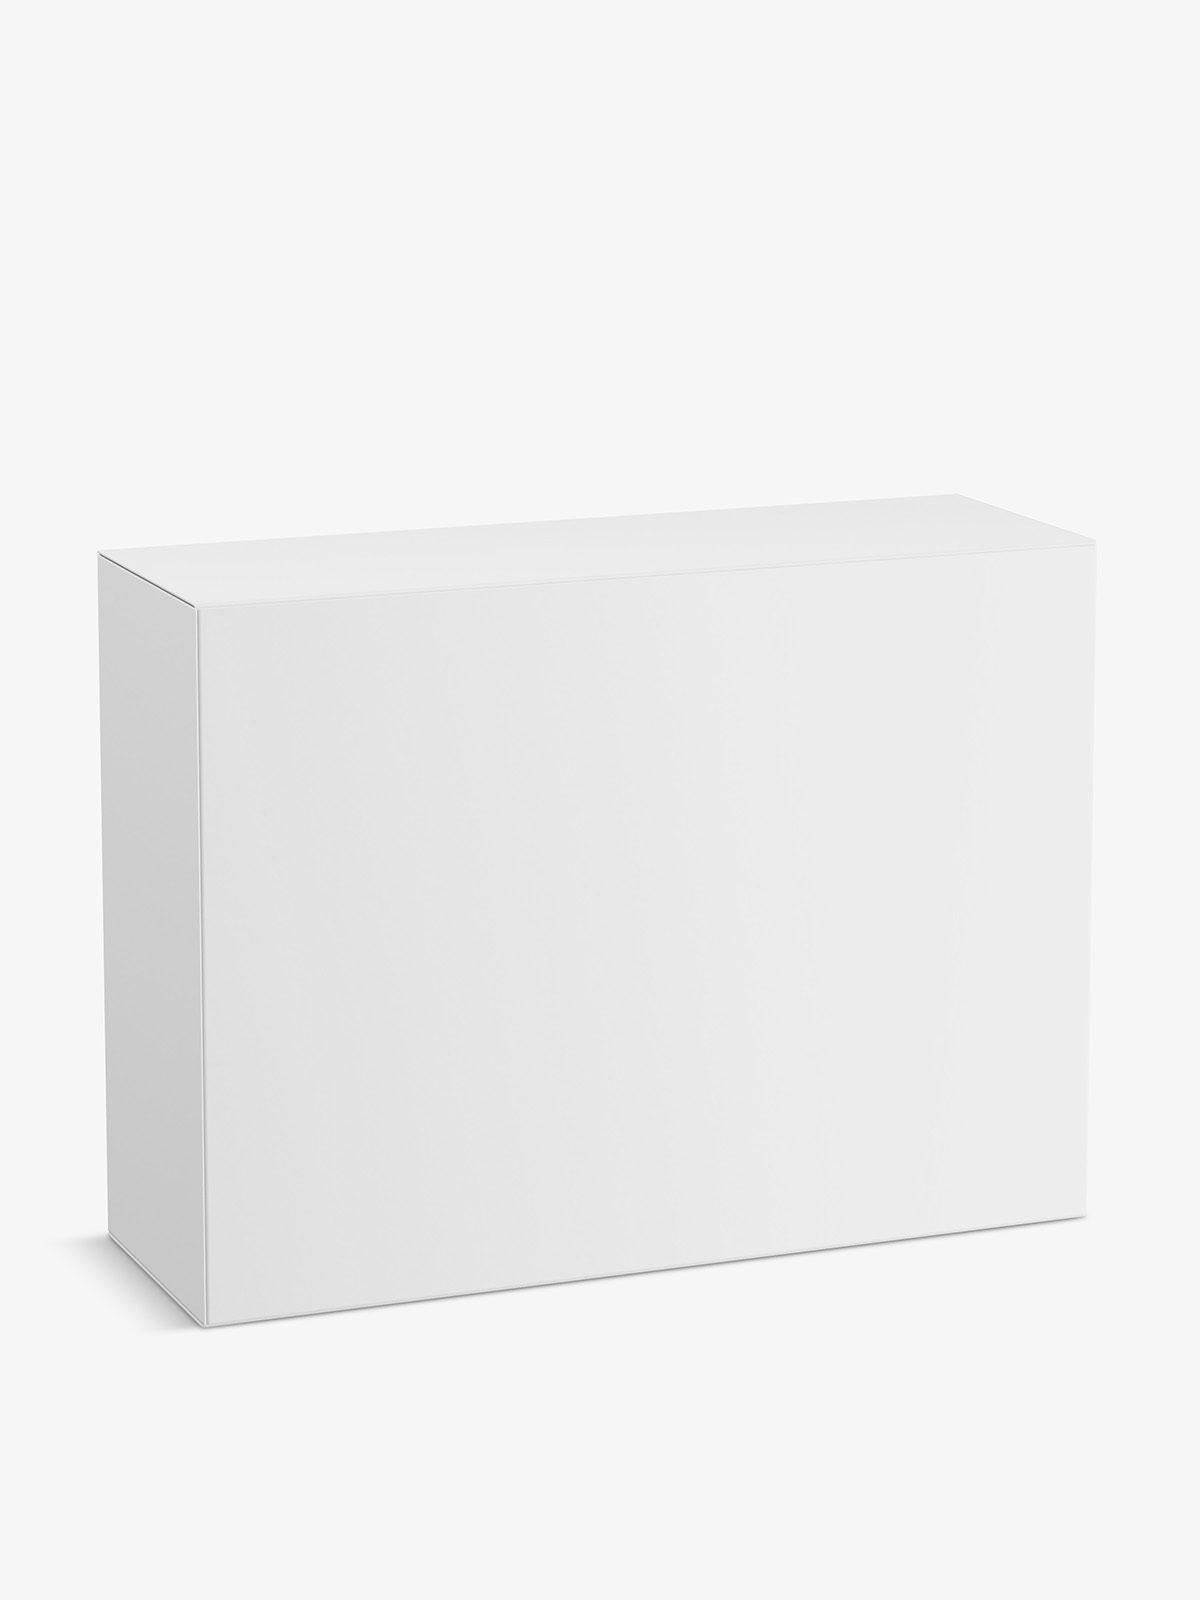 Cardboard box mockup / 200x150x70